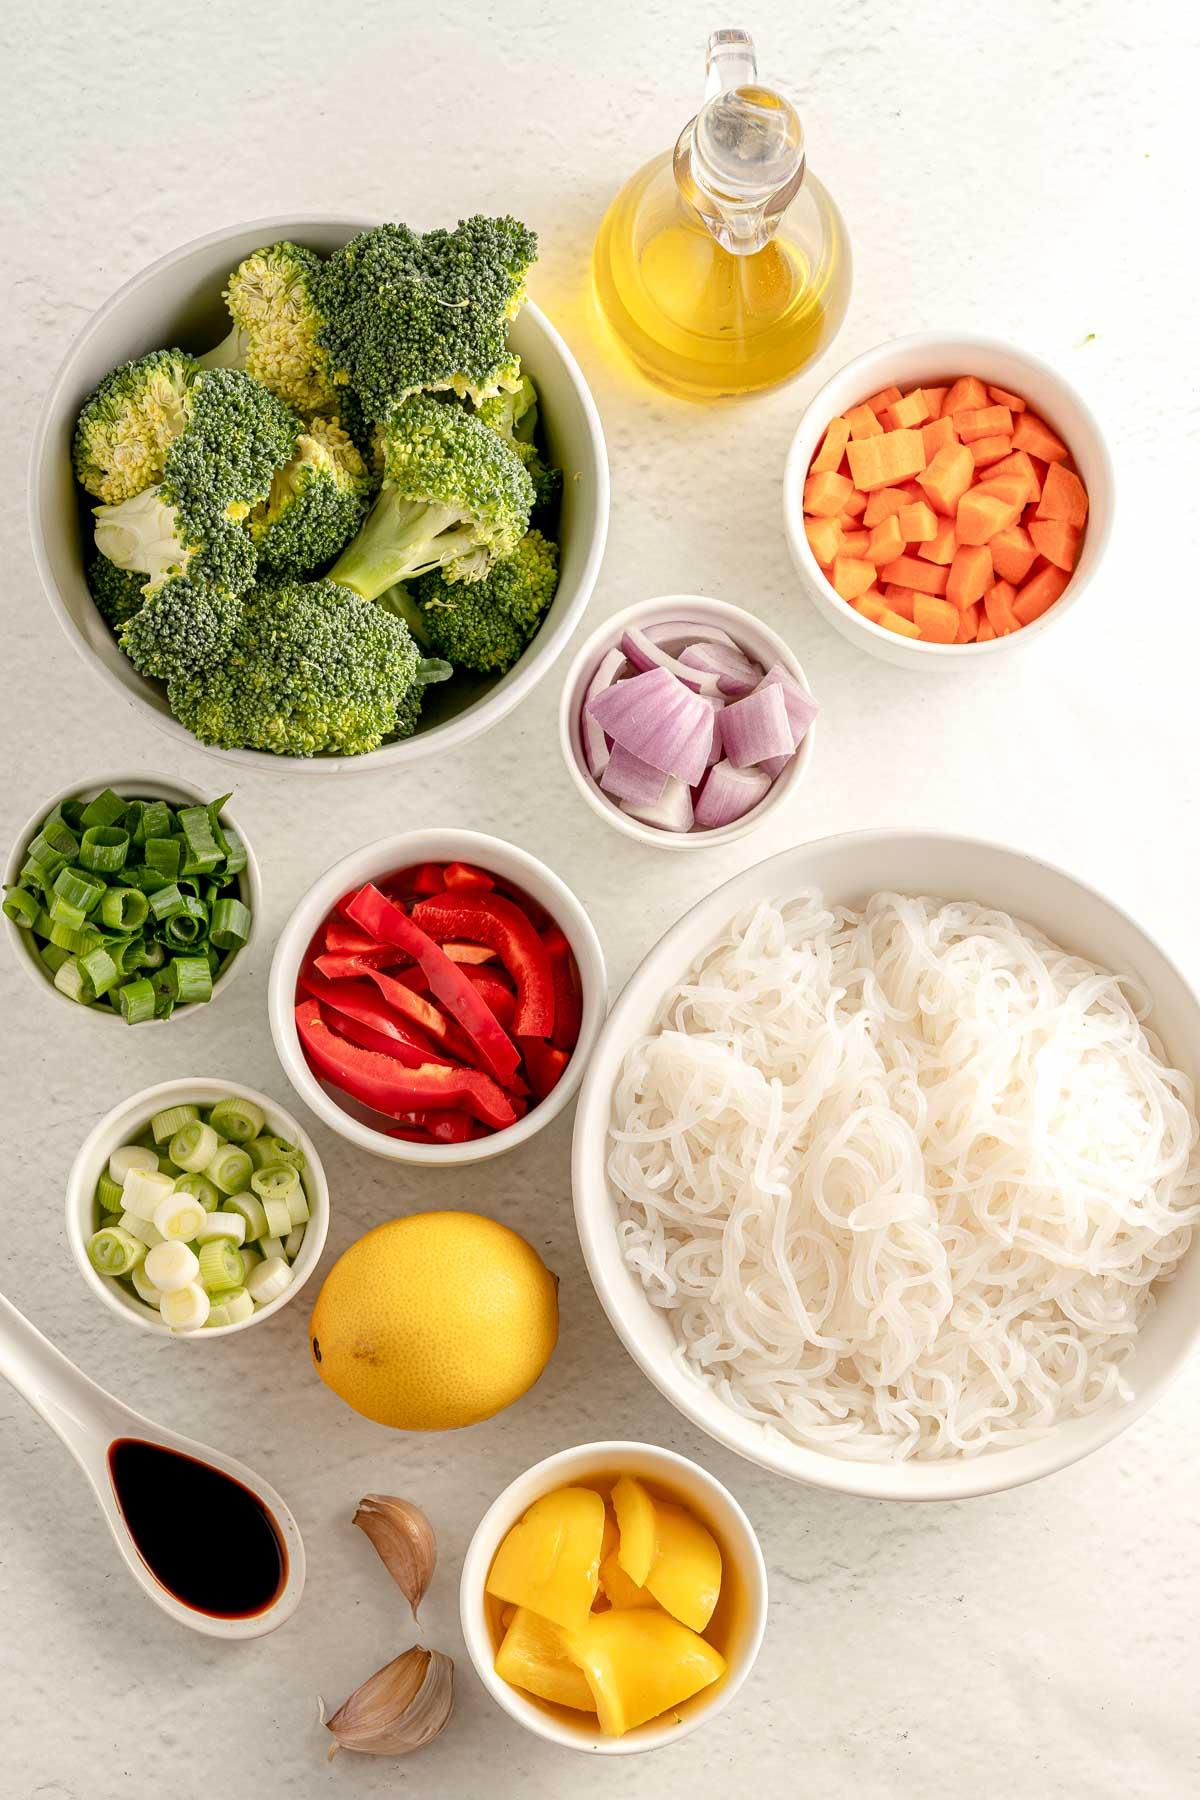 ingredients for veggie stir fry